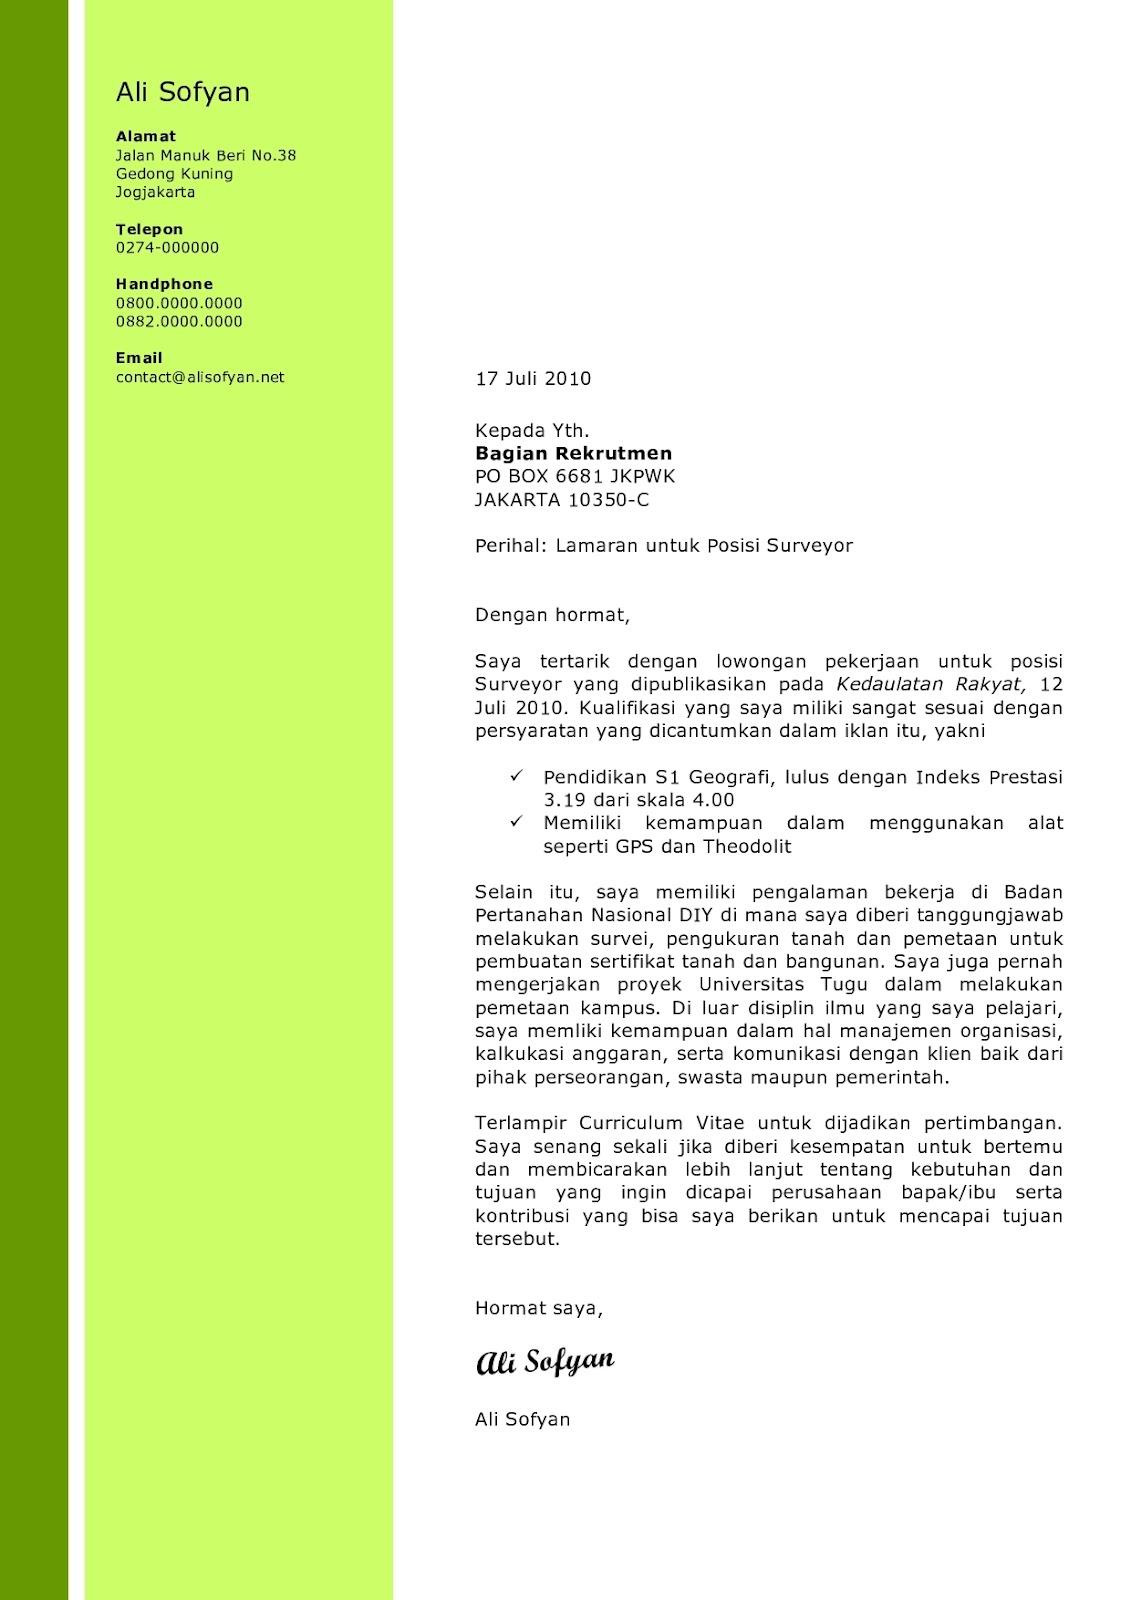 Cover Letter Architecture Fresh Graduate Cover Letter